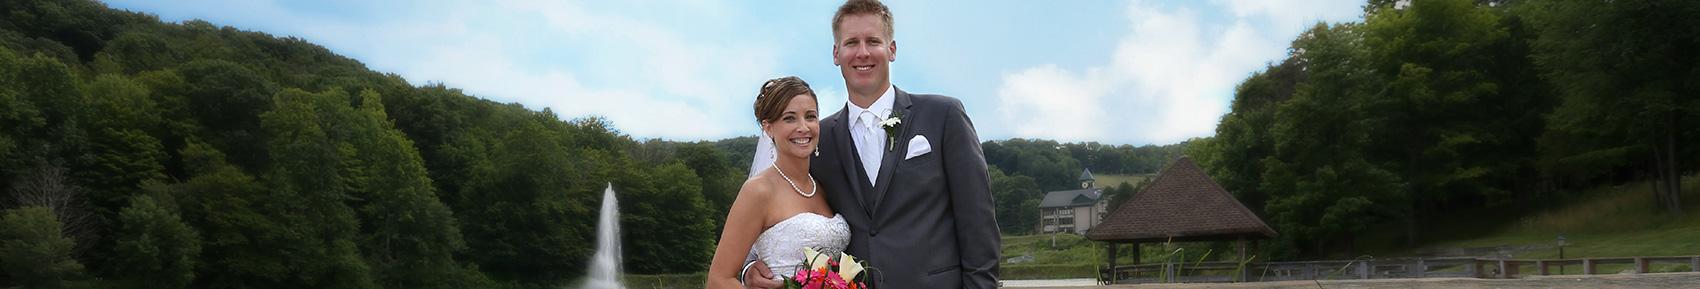 wedding-heading-8